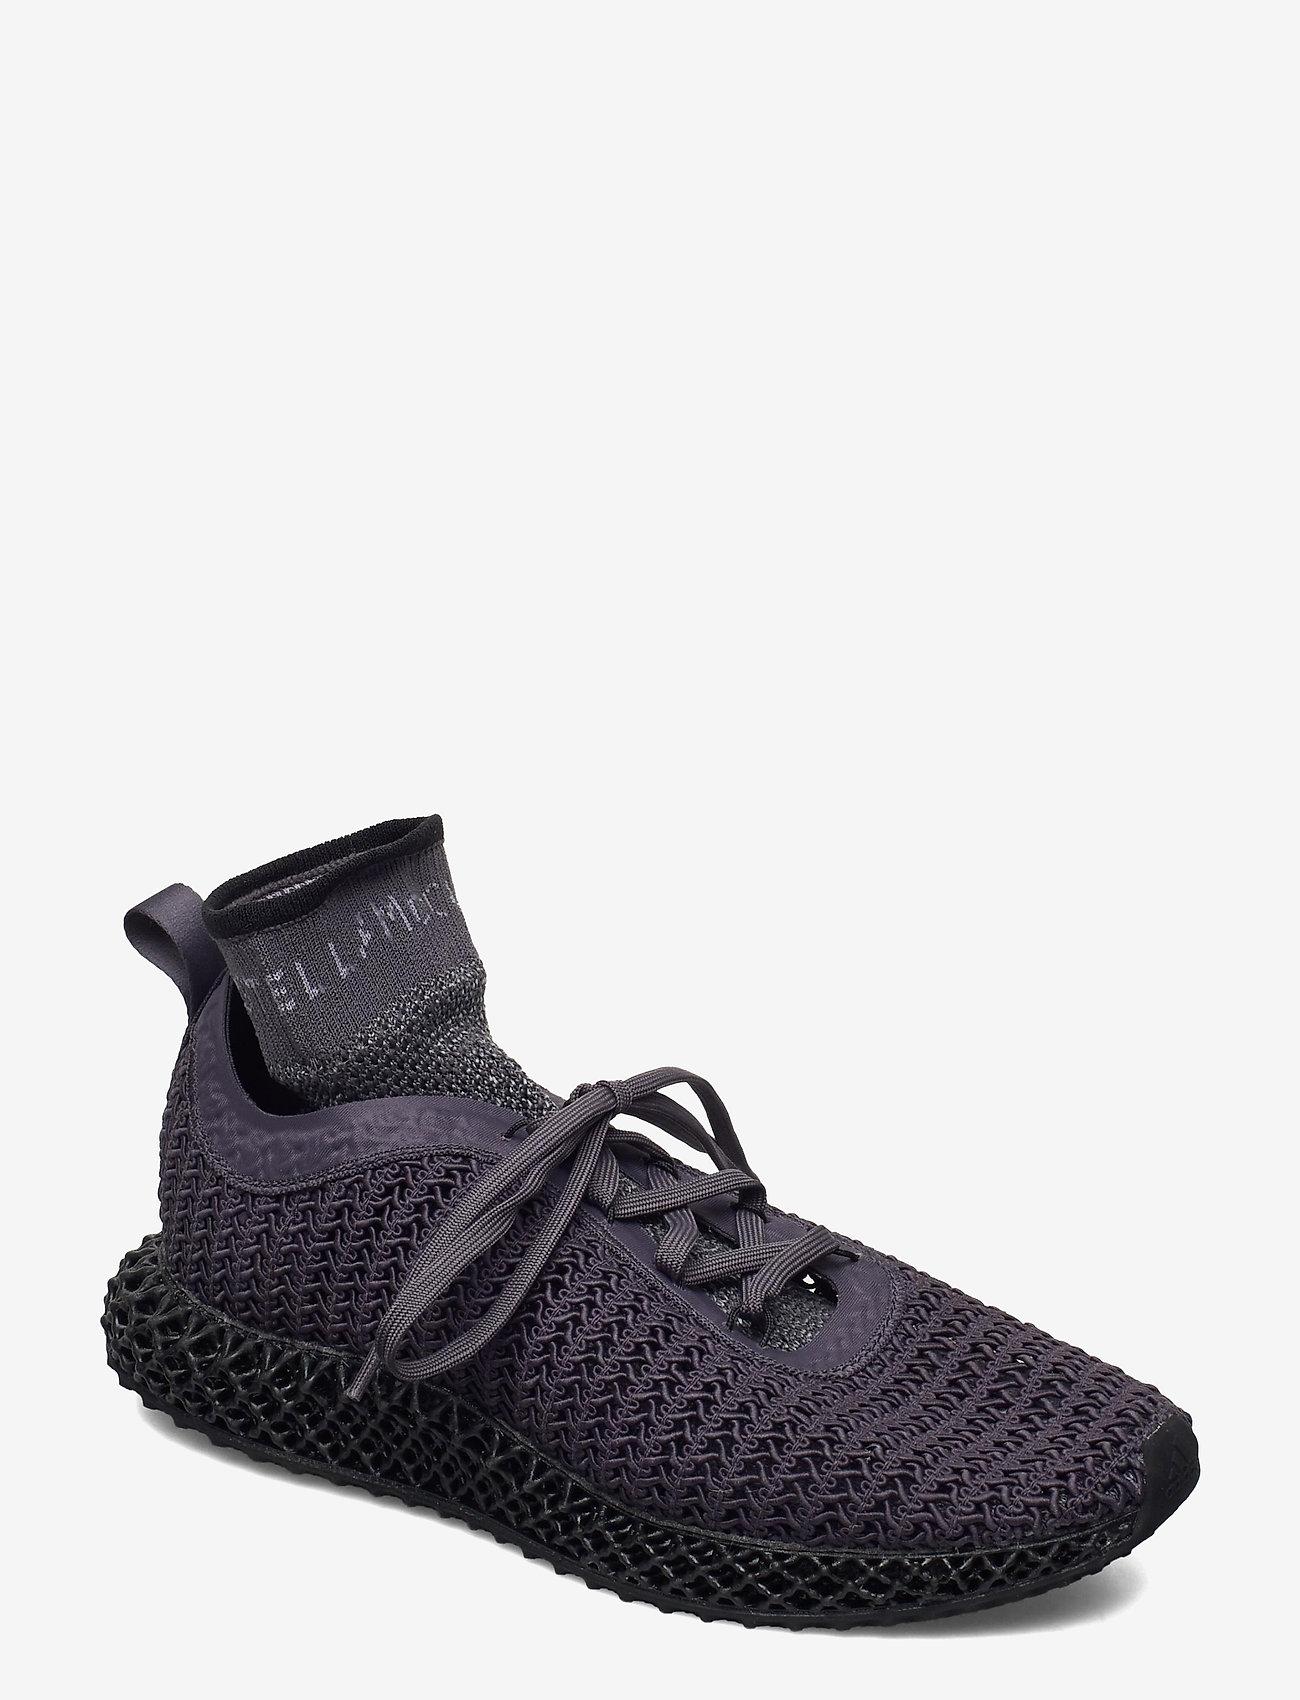 adidas by Stella McCartney - ALPHAEDGE 4D - running shoes - ngtste/cblack/plamau - 0